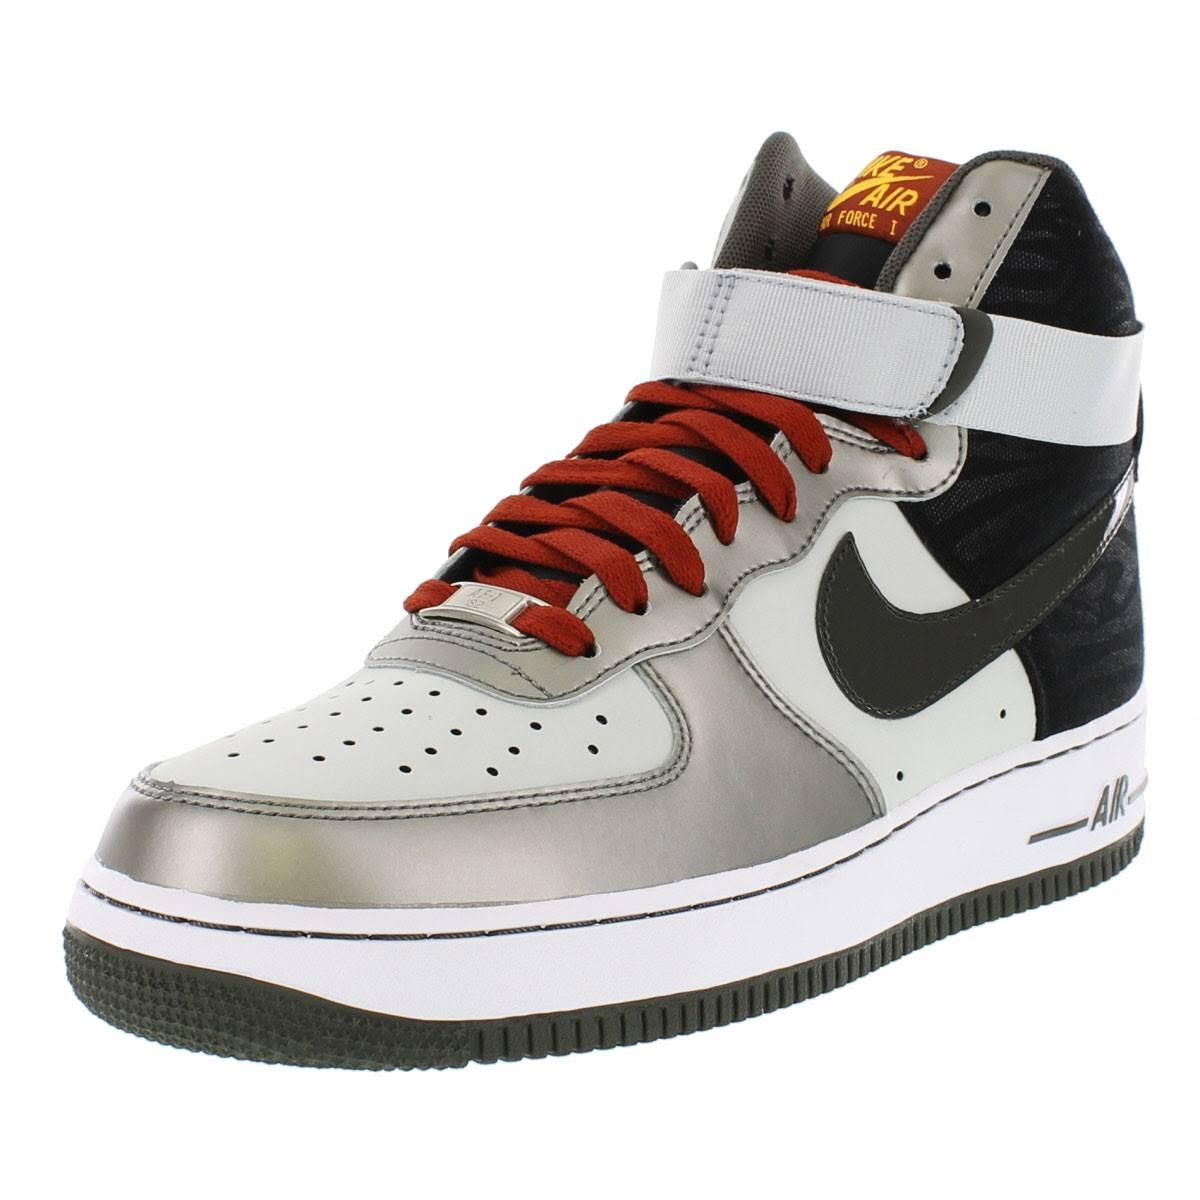 Gris 07 315121 Periódico Para Hombre Force 5 Gray 022 1 De Shoes Air Dusty Newsprint High Papel 9 Nike nIqZSn